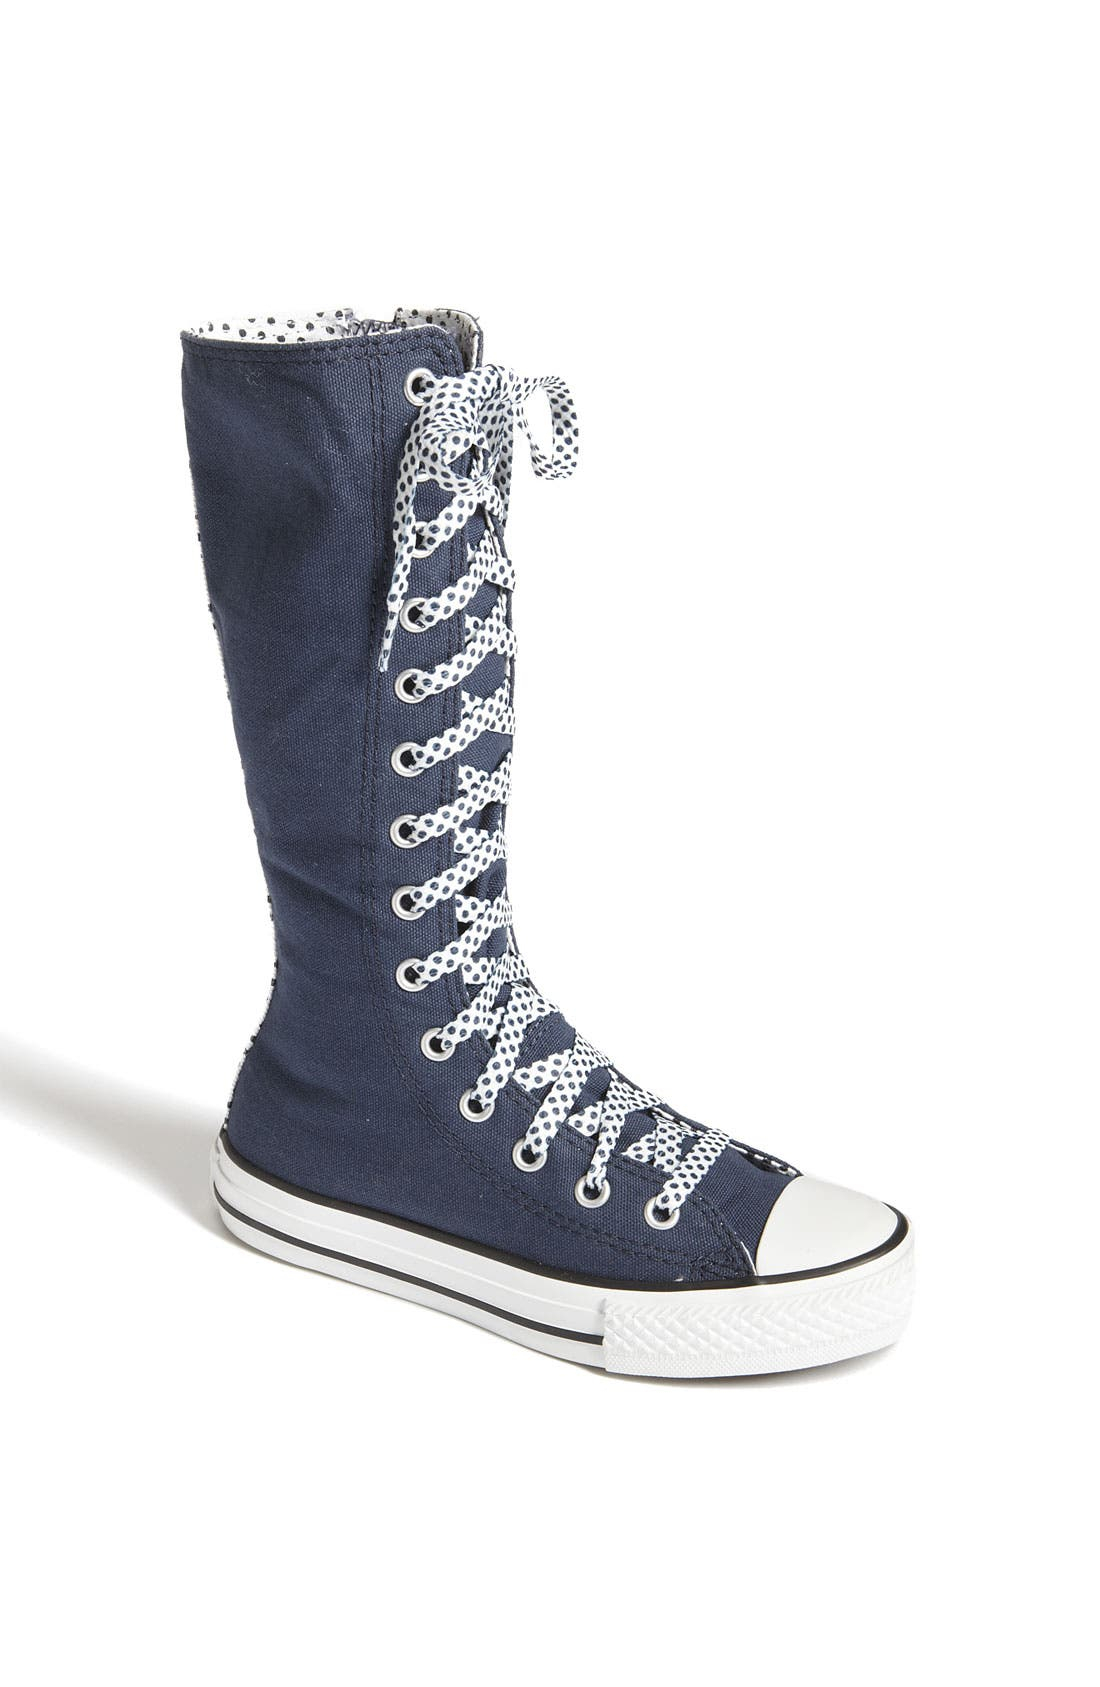 Alternate Image 1 Selected - Converse Chuck Taylor® 'X-Hi' Sneaker (Toddler, Little Kid & Big Kid)